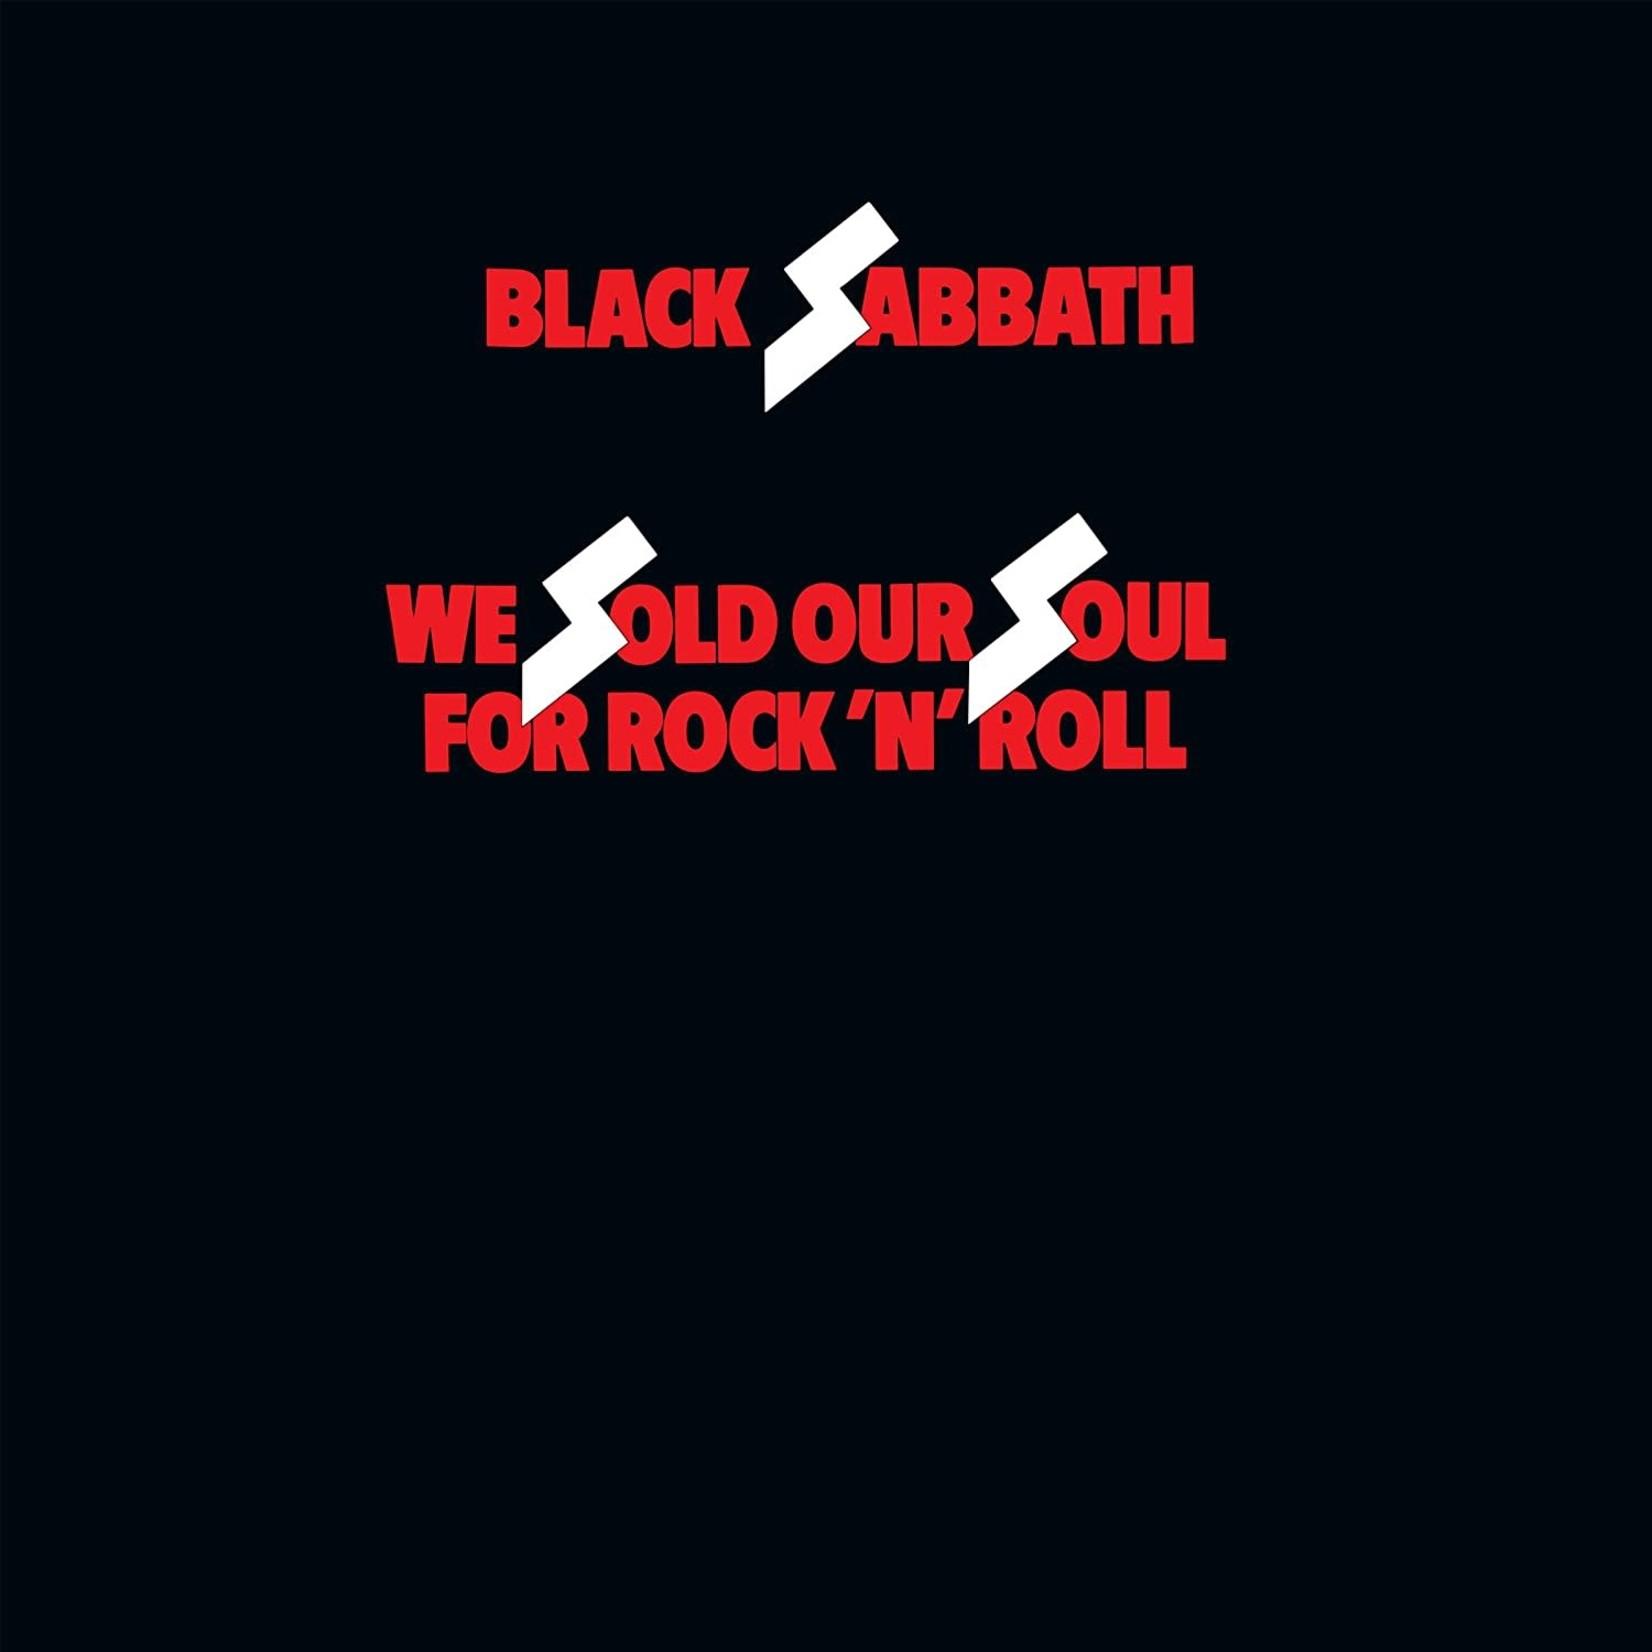 [New] Black Sabbath: We Sold Our Soul For Rock 'N' Roll (2LP, red vinyl)